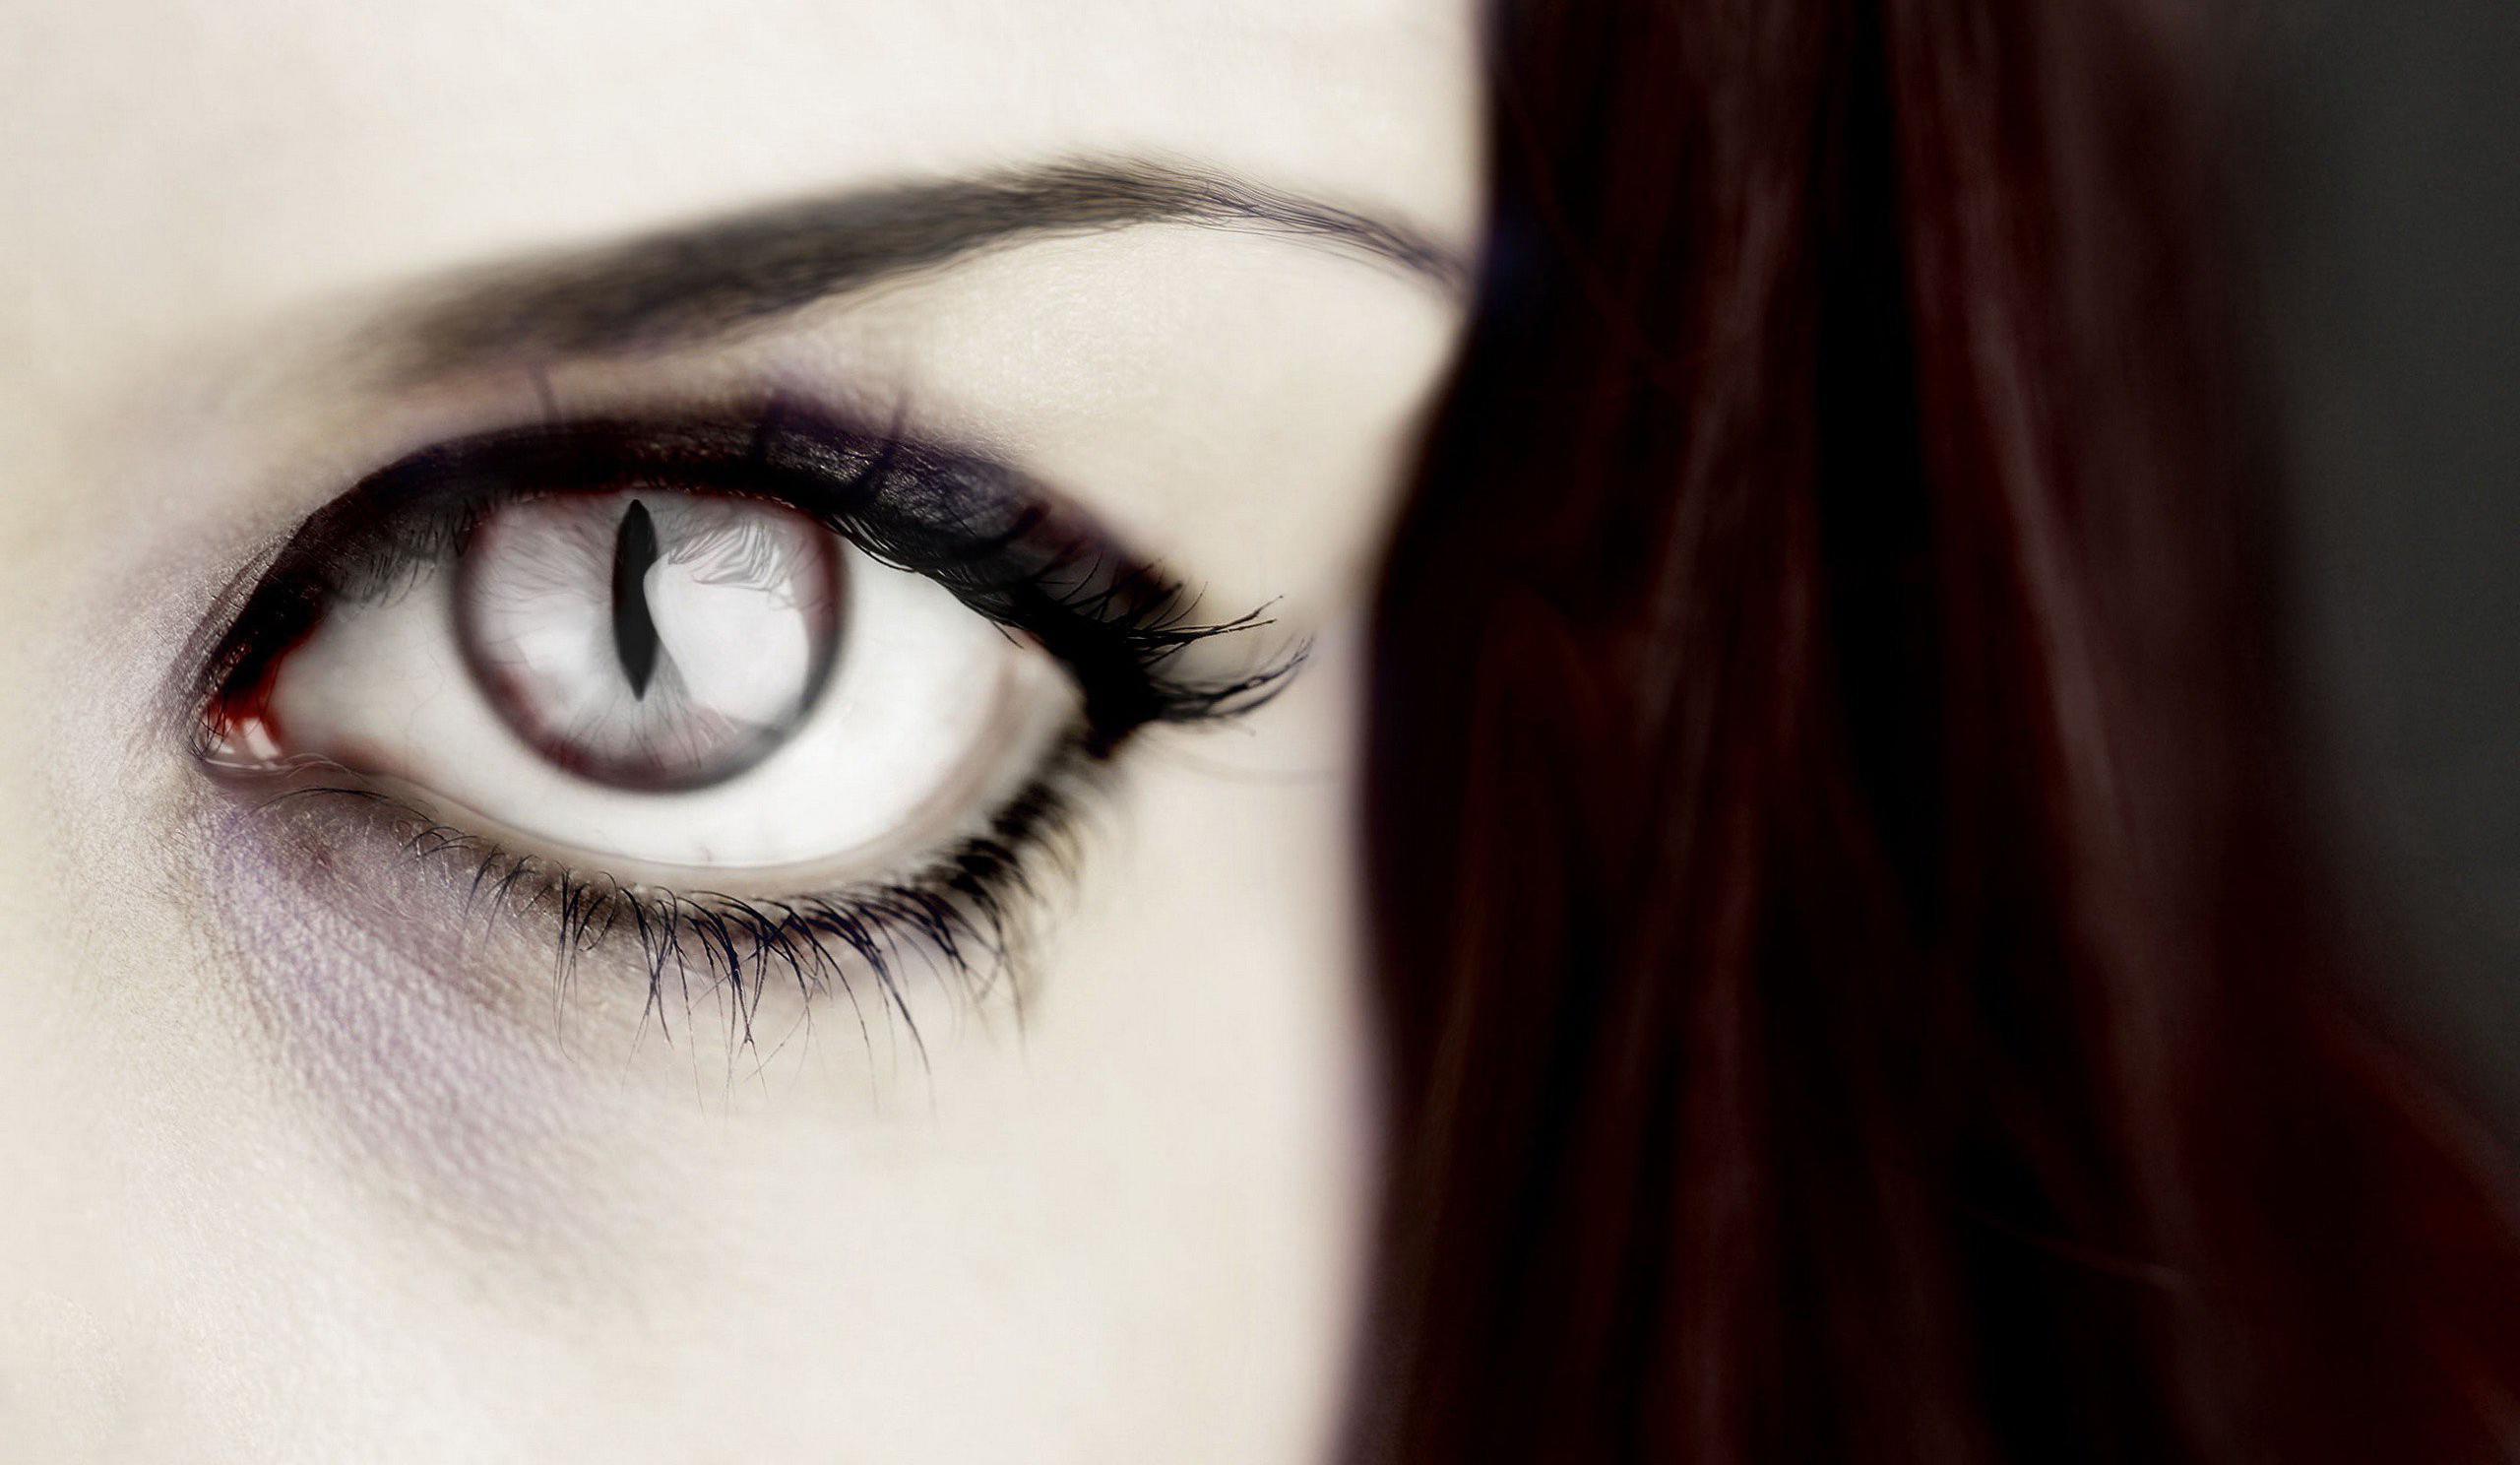 Wallpaper Nose Watches Iris Movie Characters Girl Lip Image Cosmetics Cheek Objects Eyebrow Human Body Organ Close Up